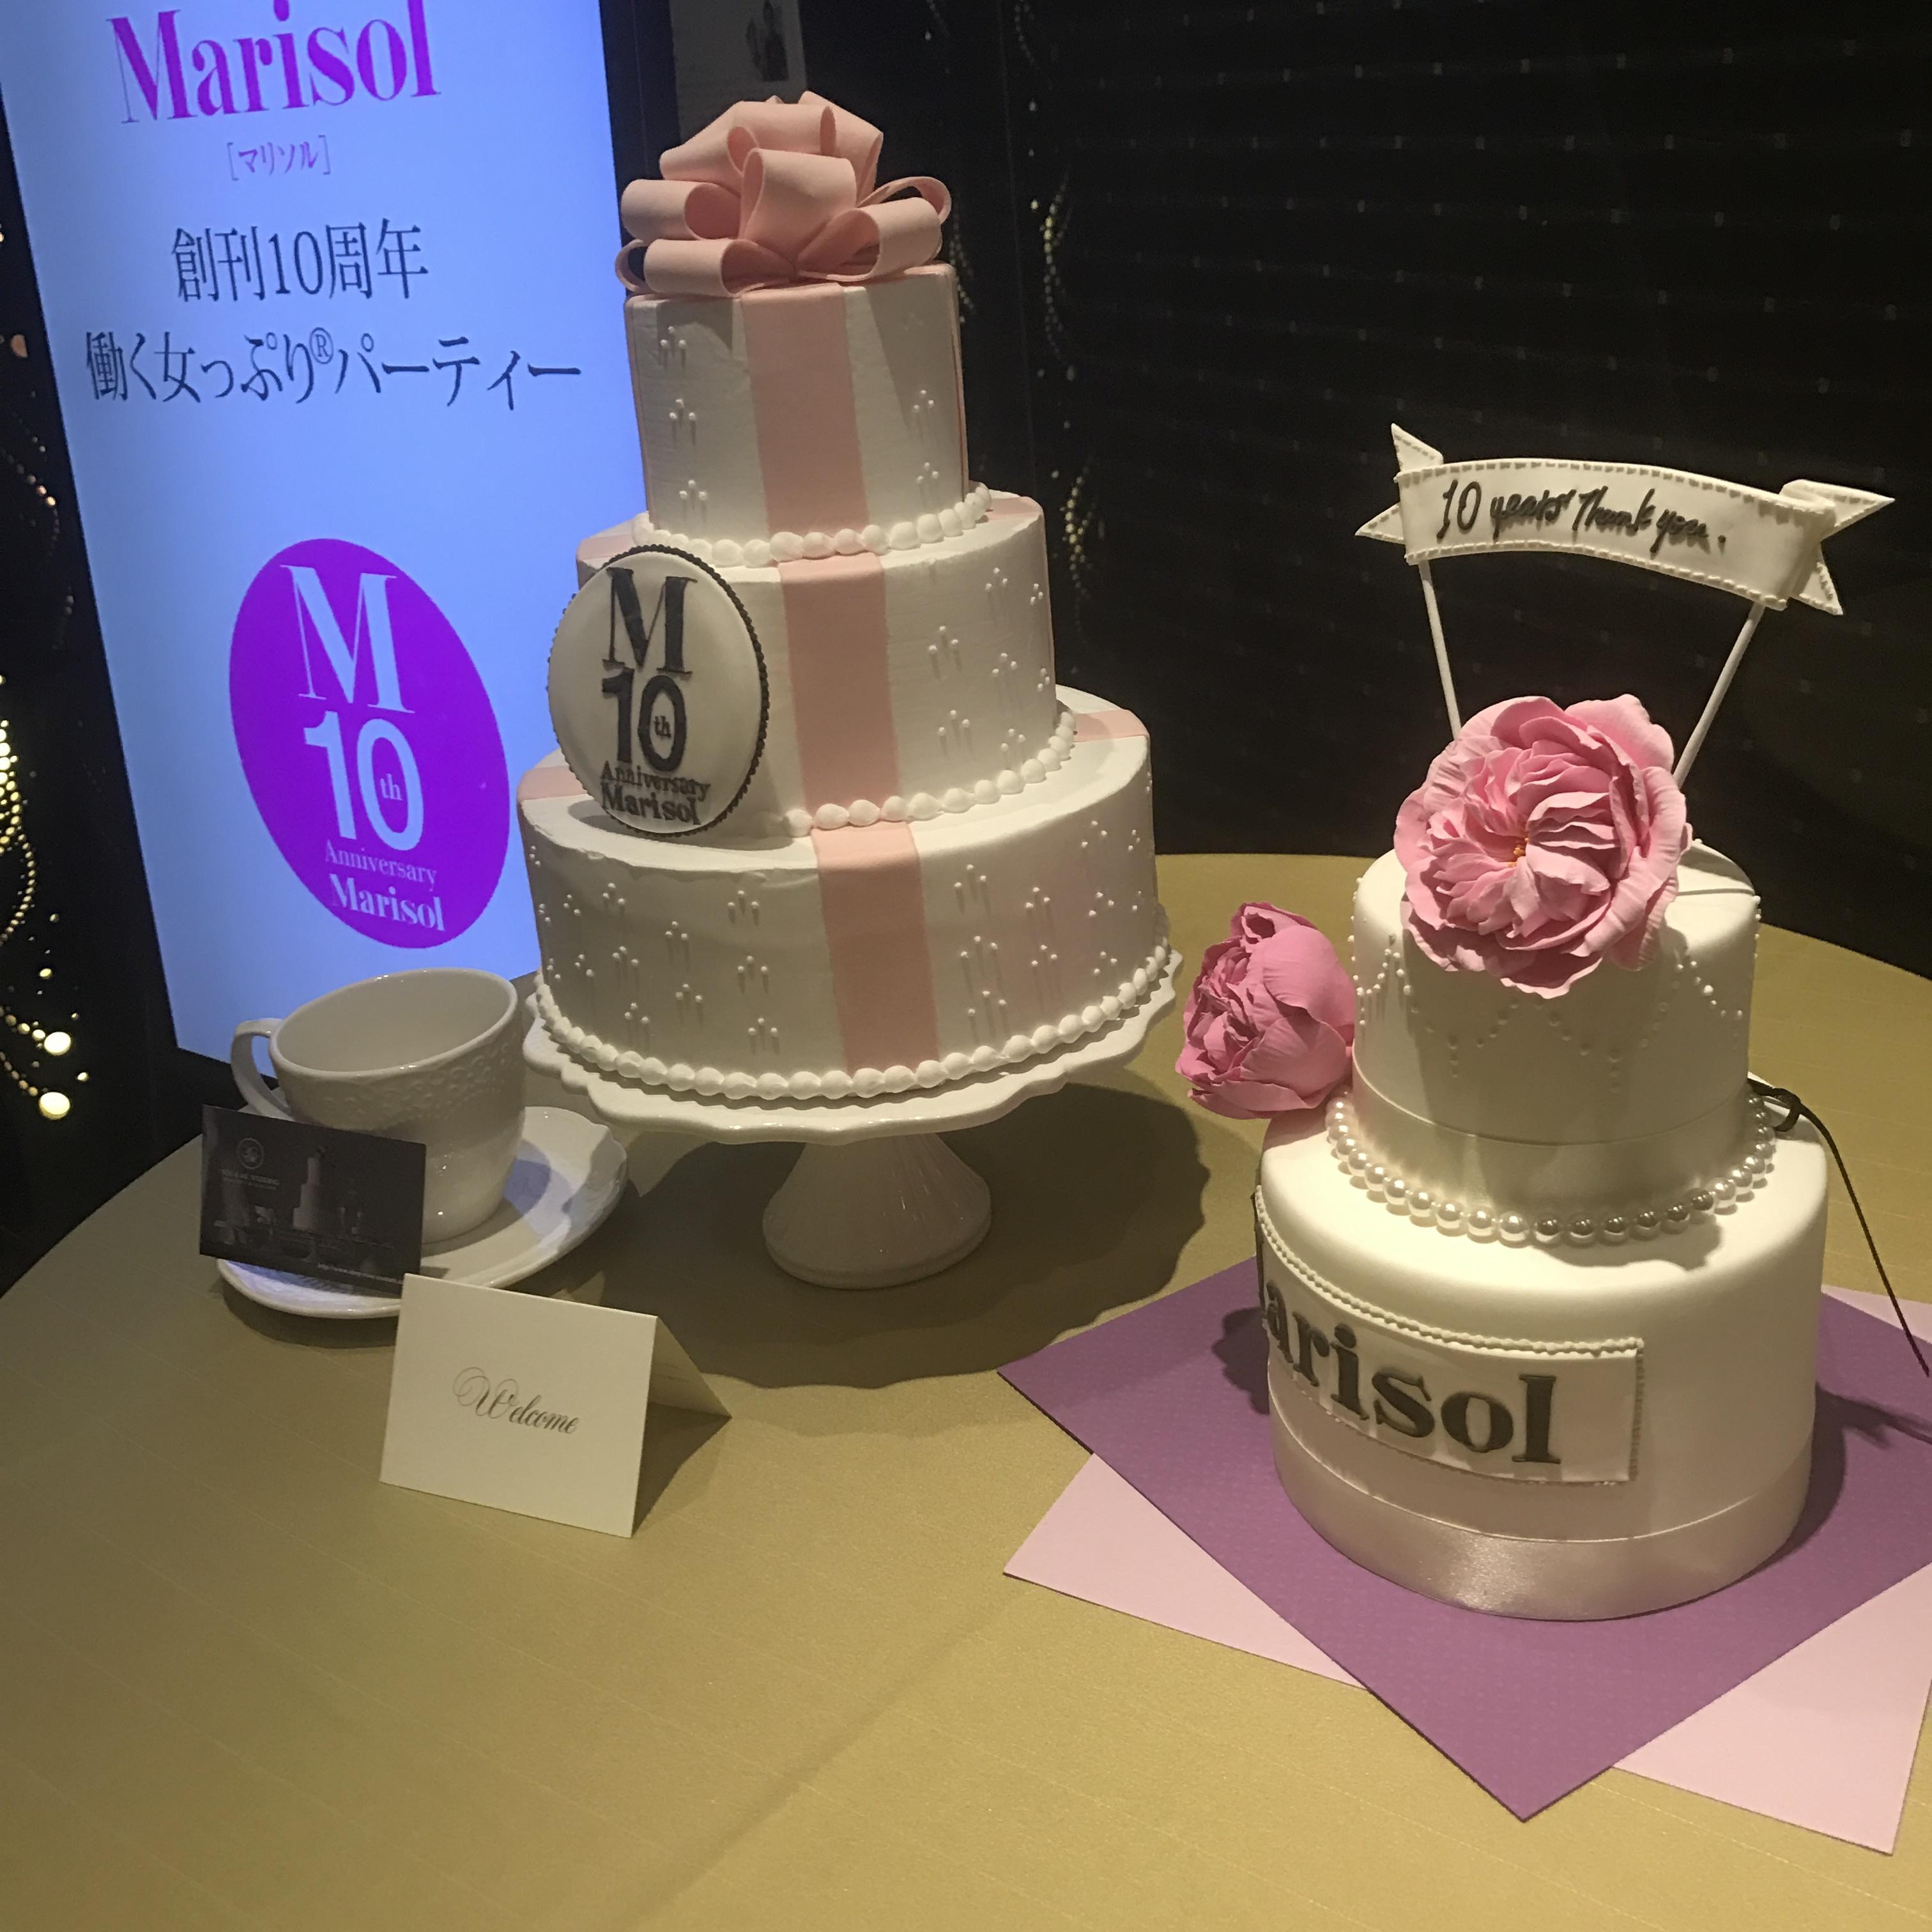 Marisol 10th anniversary♡創刊10周年記念パーティへ。_1_2-3